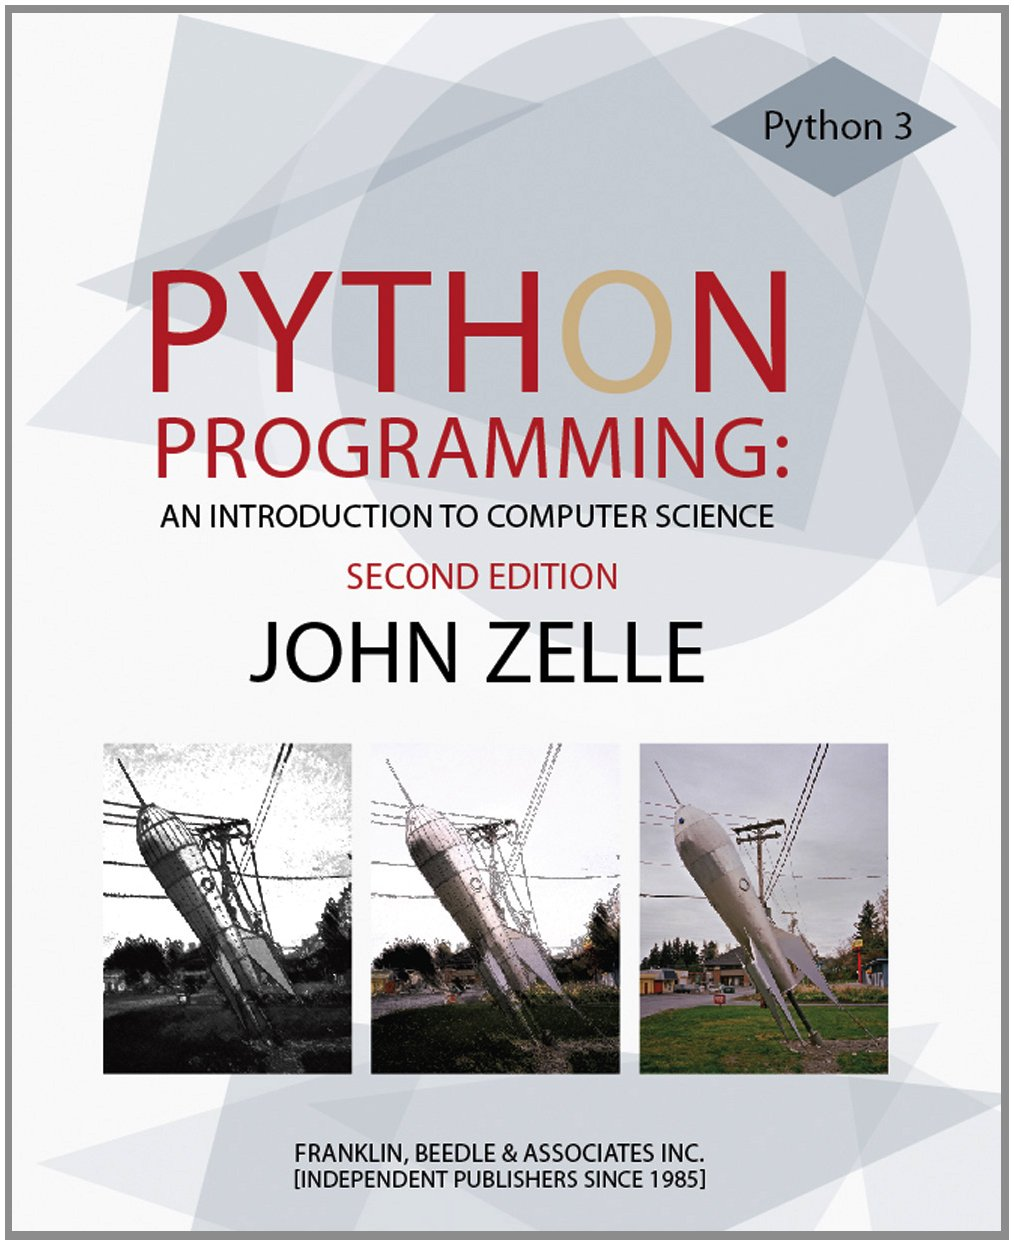 Python Textbook